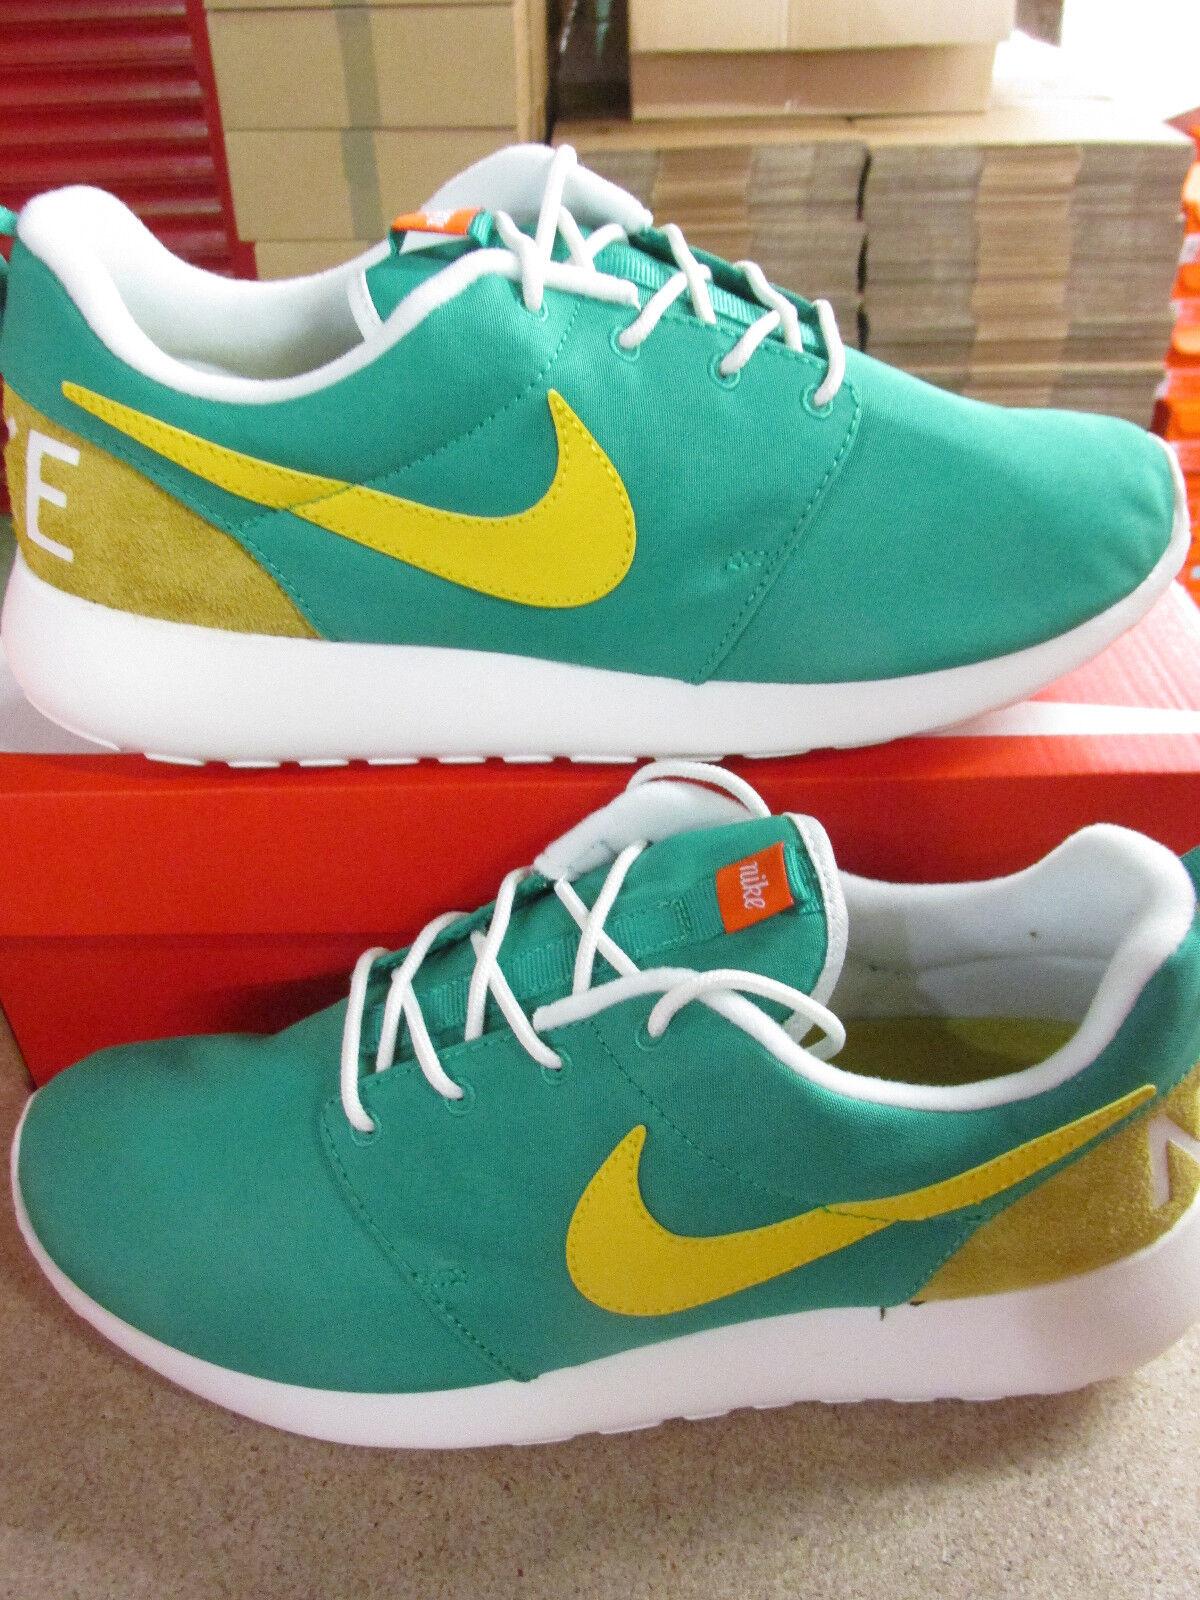 Nike roshe 819881 un retro Uomo formatori 819881 roshe 371 scarpe, scarpe 85610b